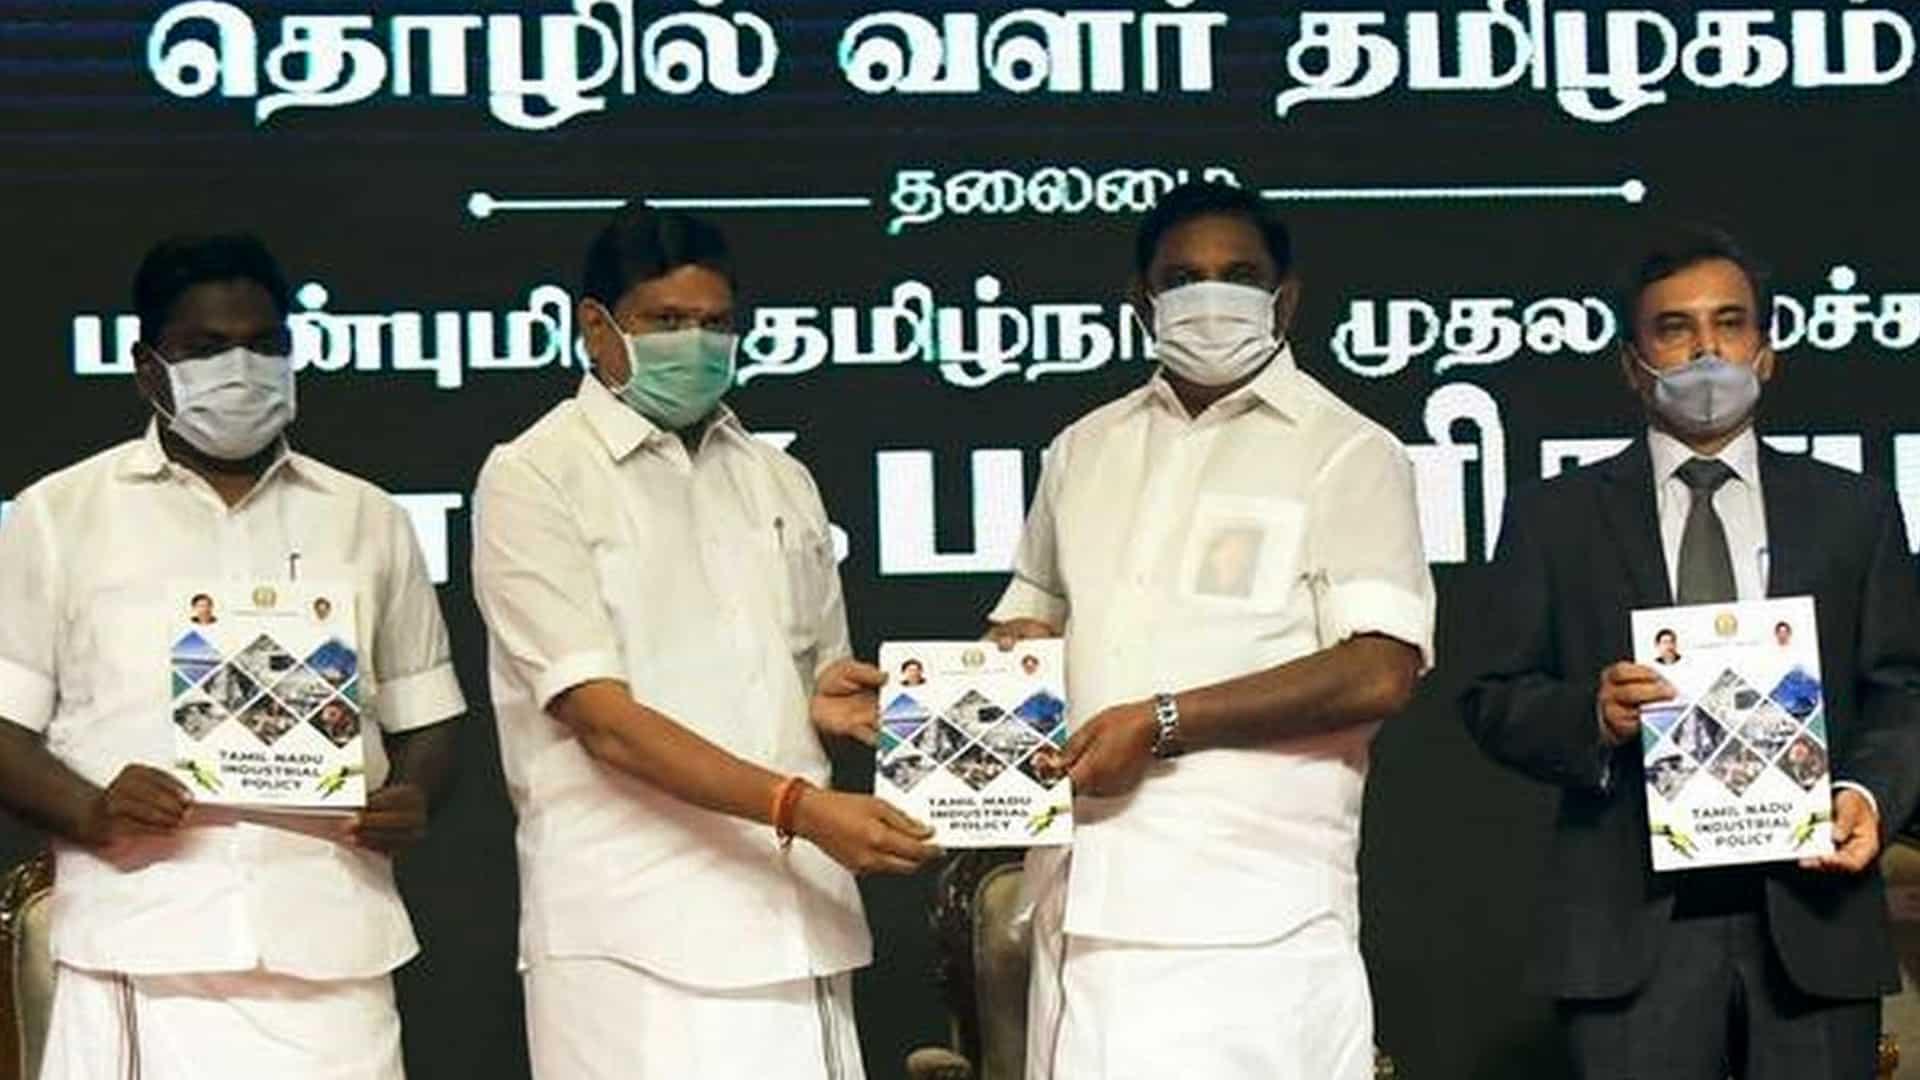 TN CM unveils new industrial, MSME policies